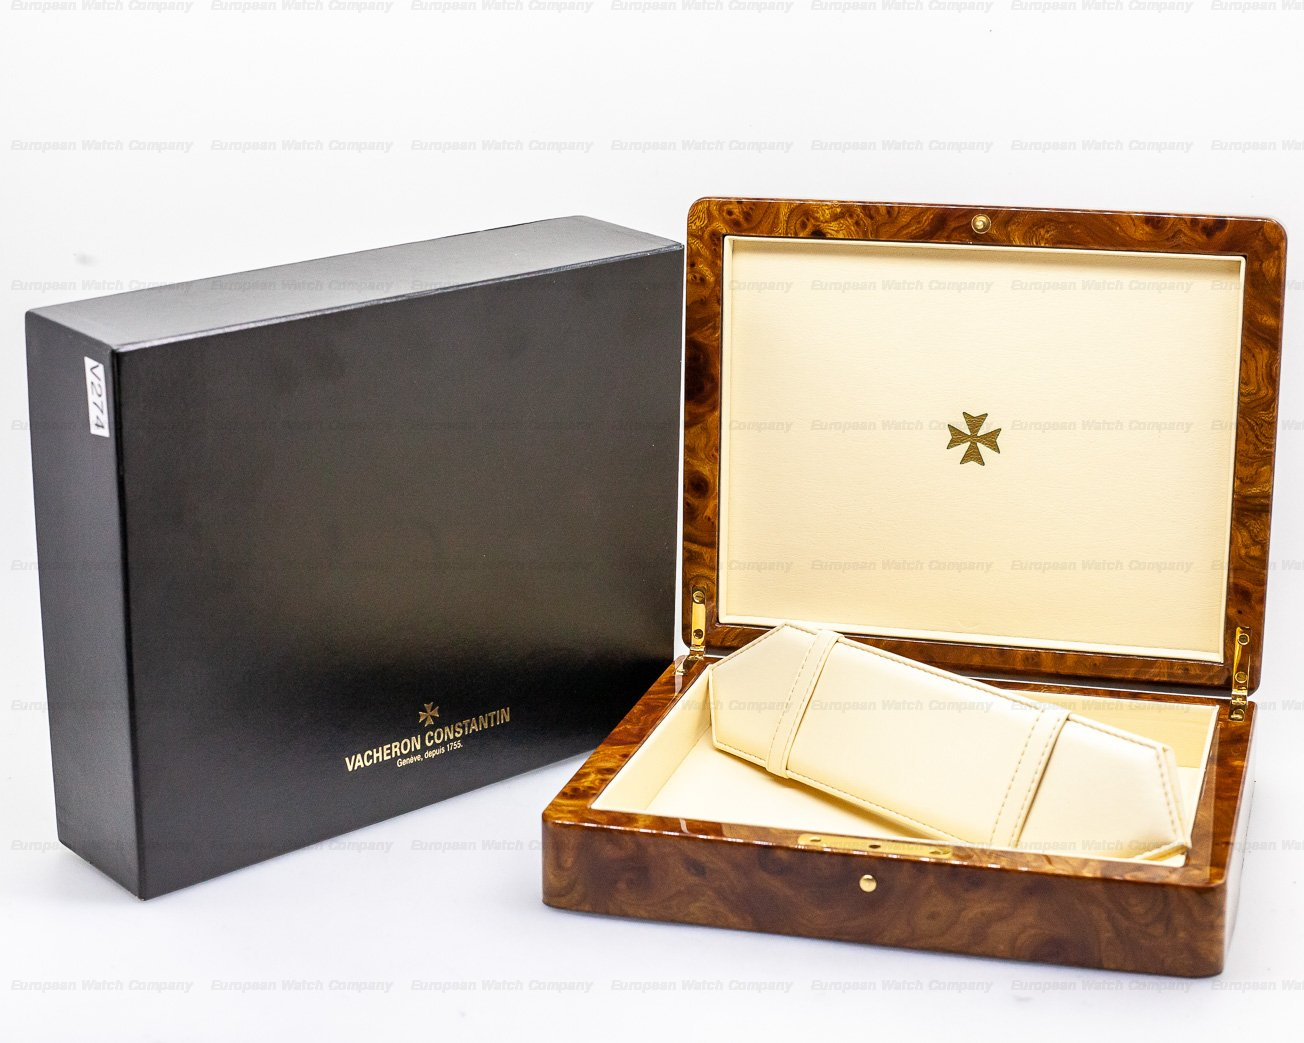 Vacheron Constantin 47051/000G-8759 Triple Date 18K White Gold / White Gold Tang Buckle PATINA